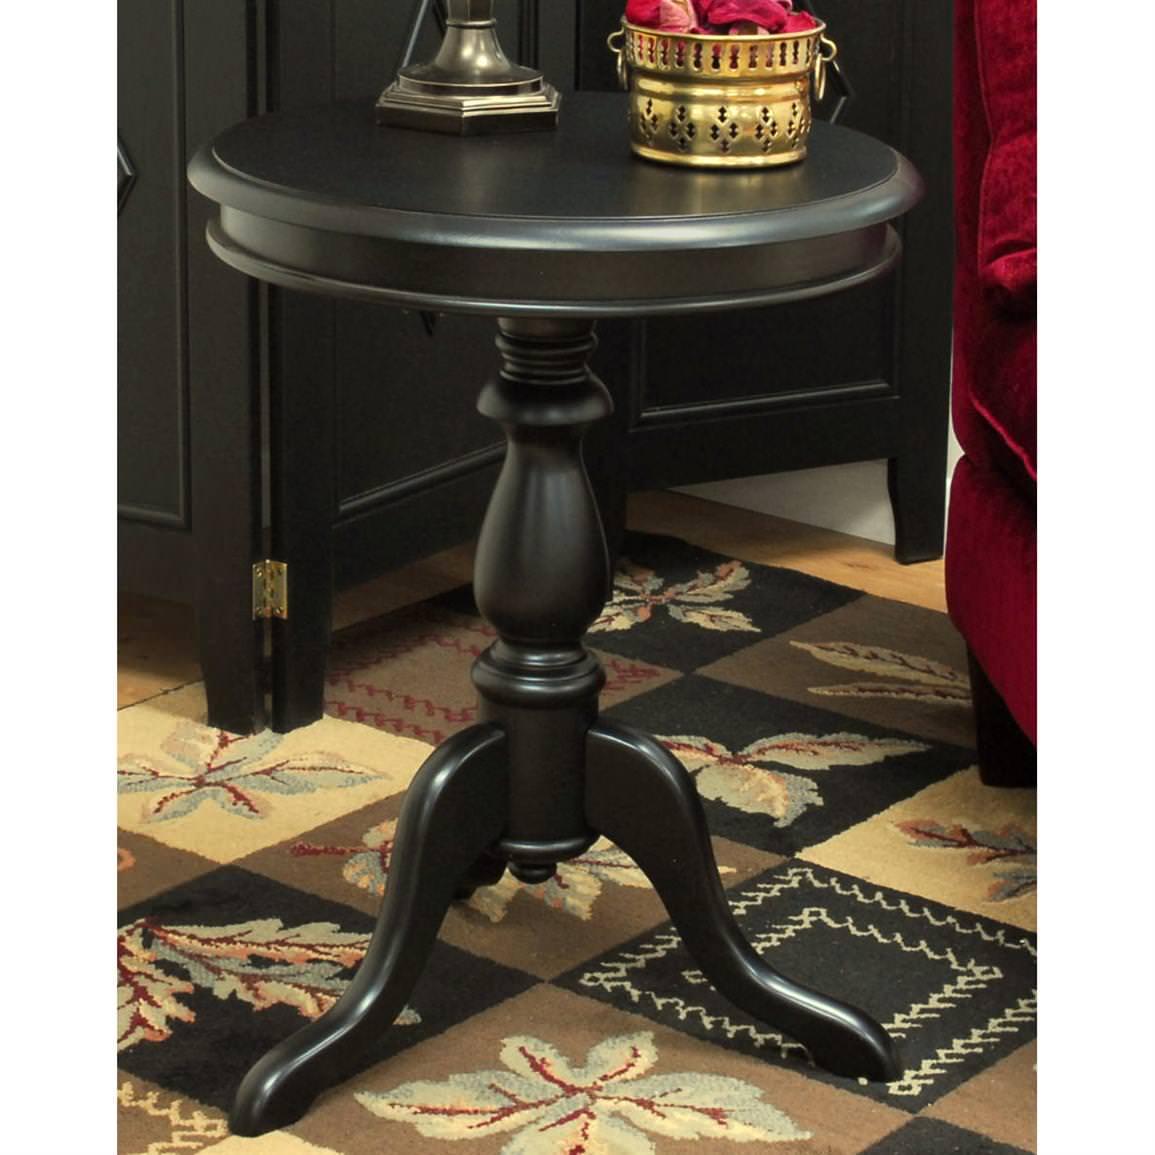 build pedestal accent table khandzoo home decor black tables edmonton dale tiffany pendant lights bamboo glass top for coffee oak bedside verizon tablet wooden cabinets trestle